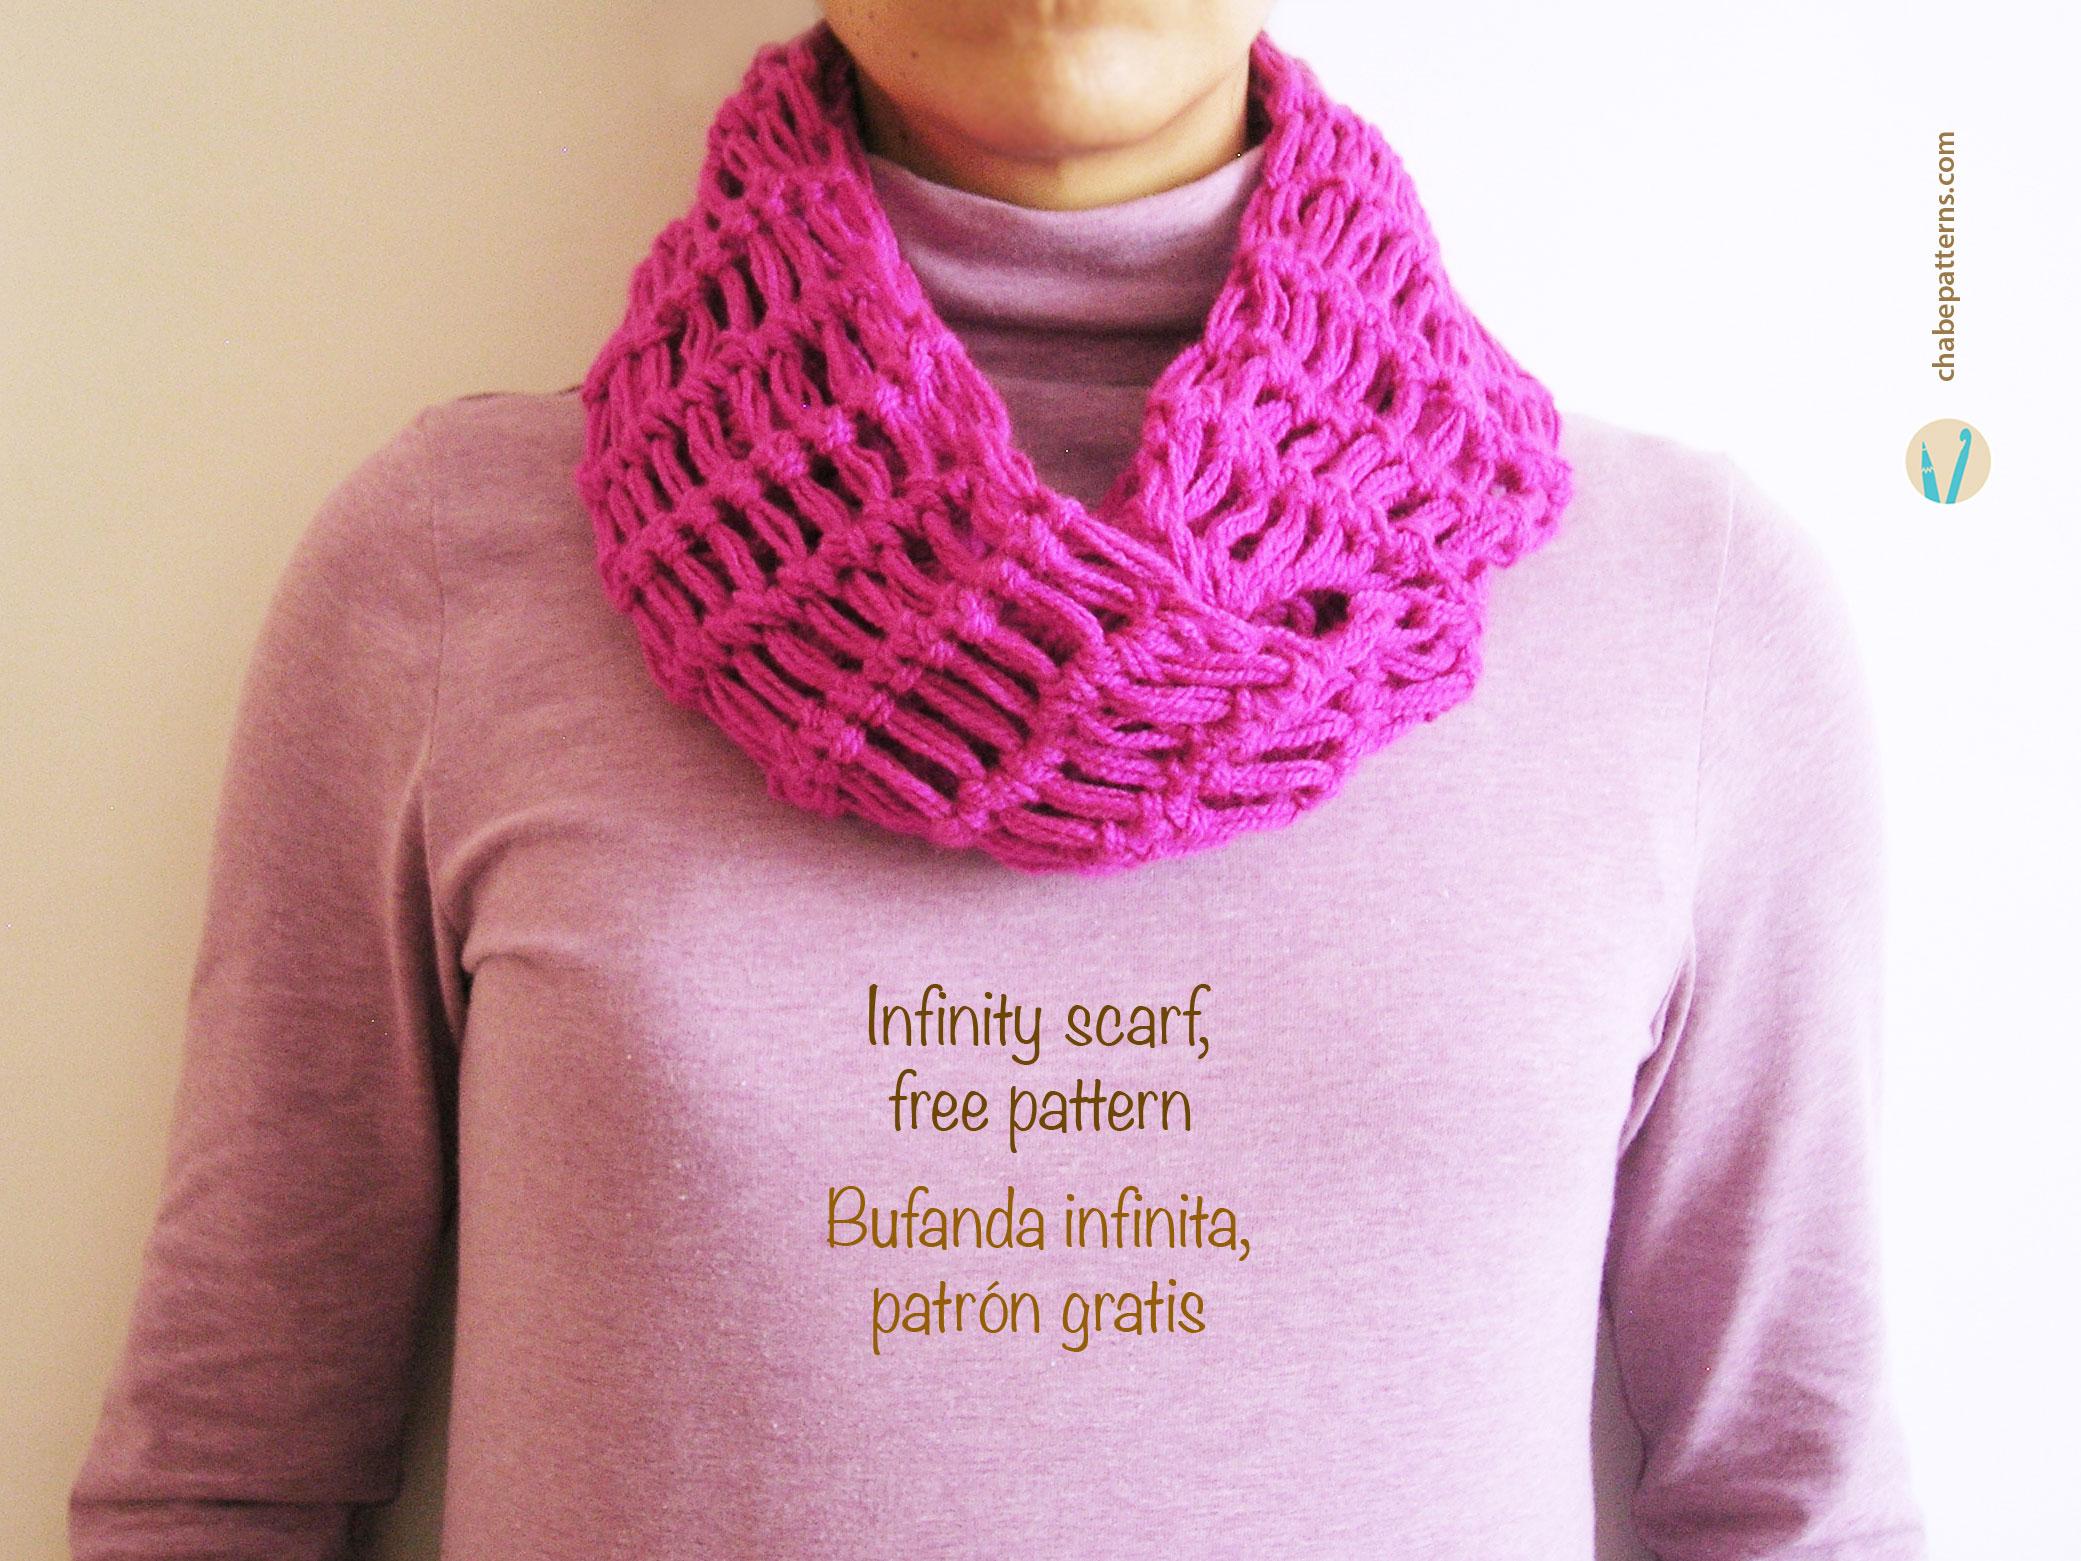 Infinity scarf/ Bufanda infinita